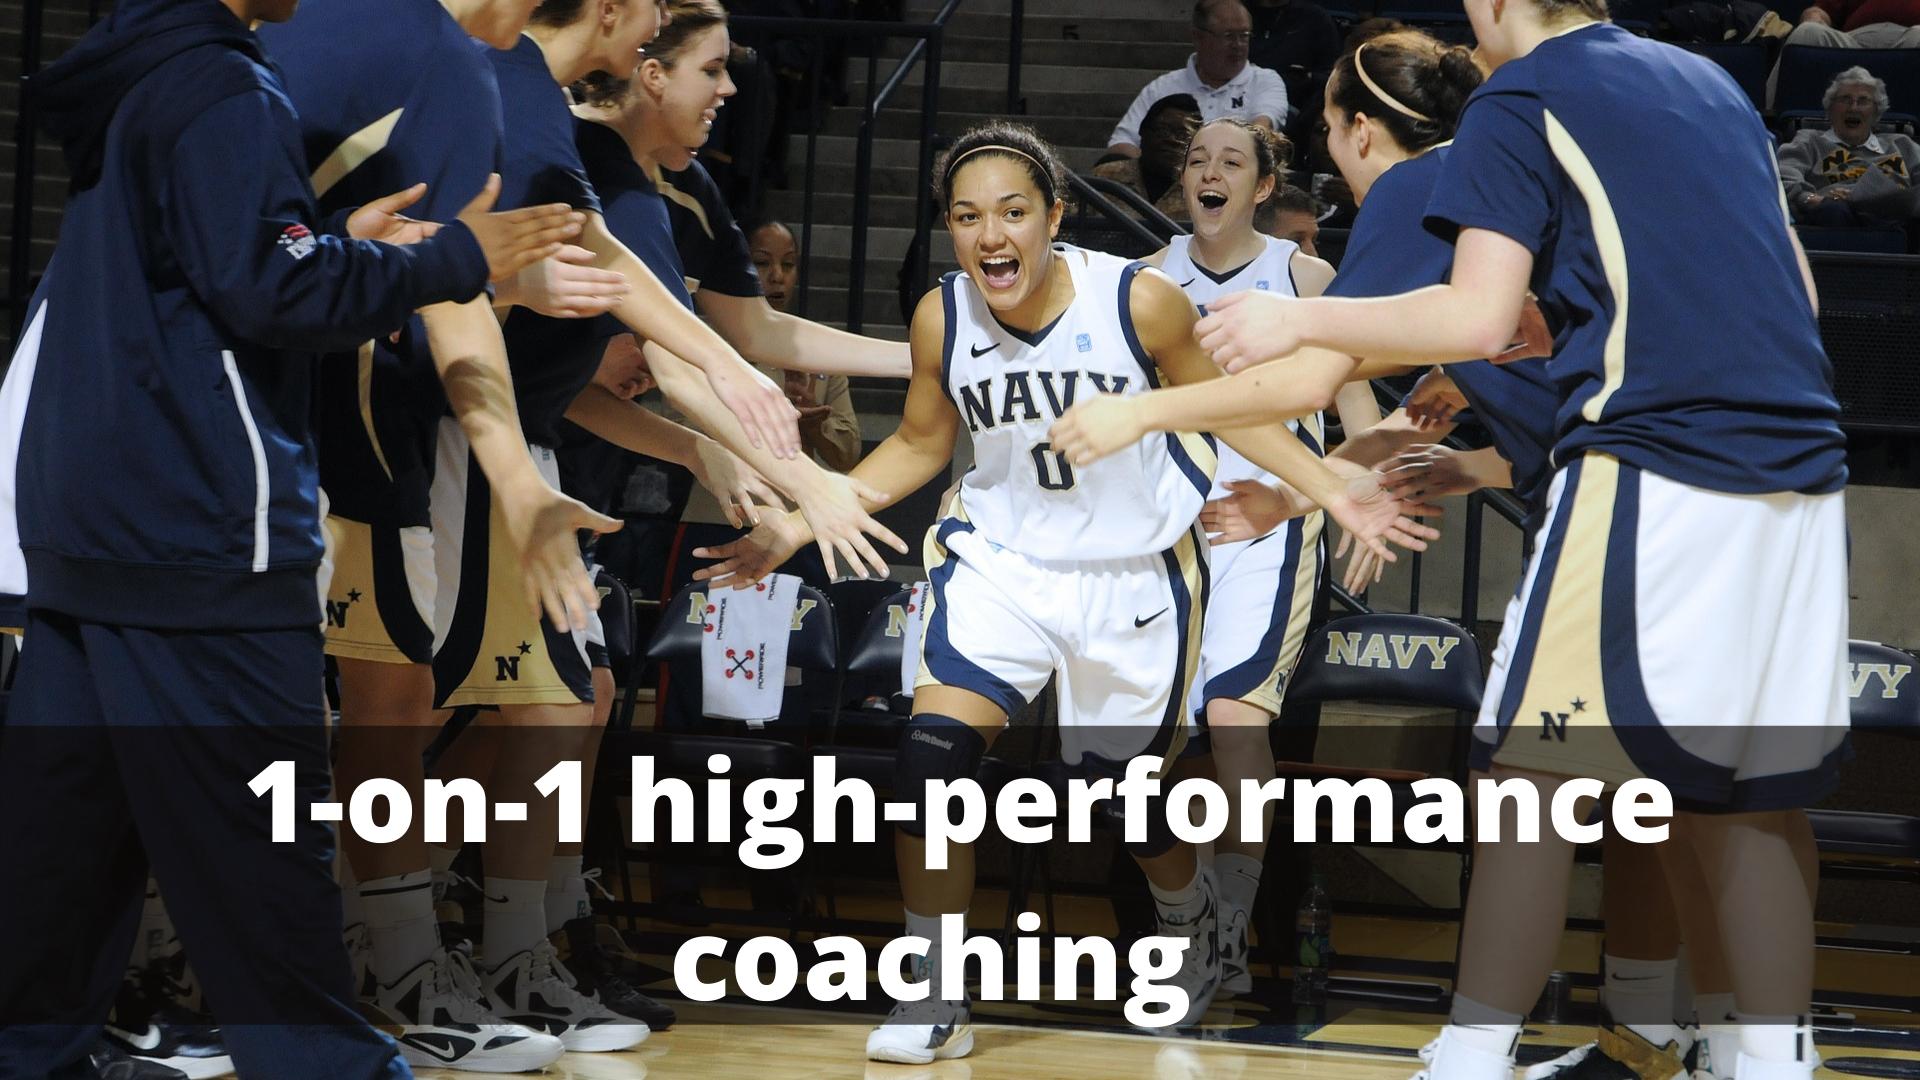 1-on-1 high-performance coaching with Bob Palmer